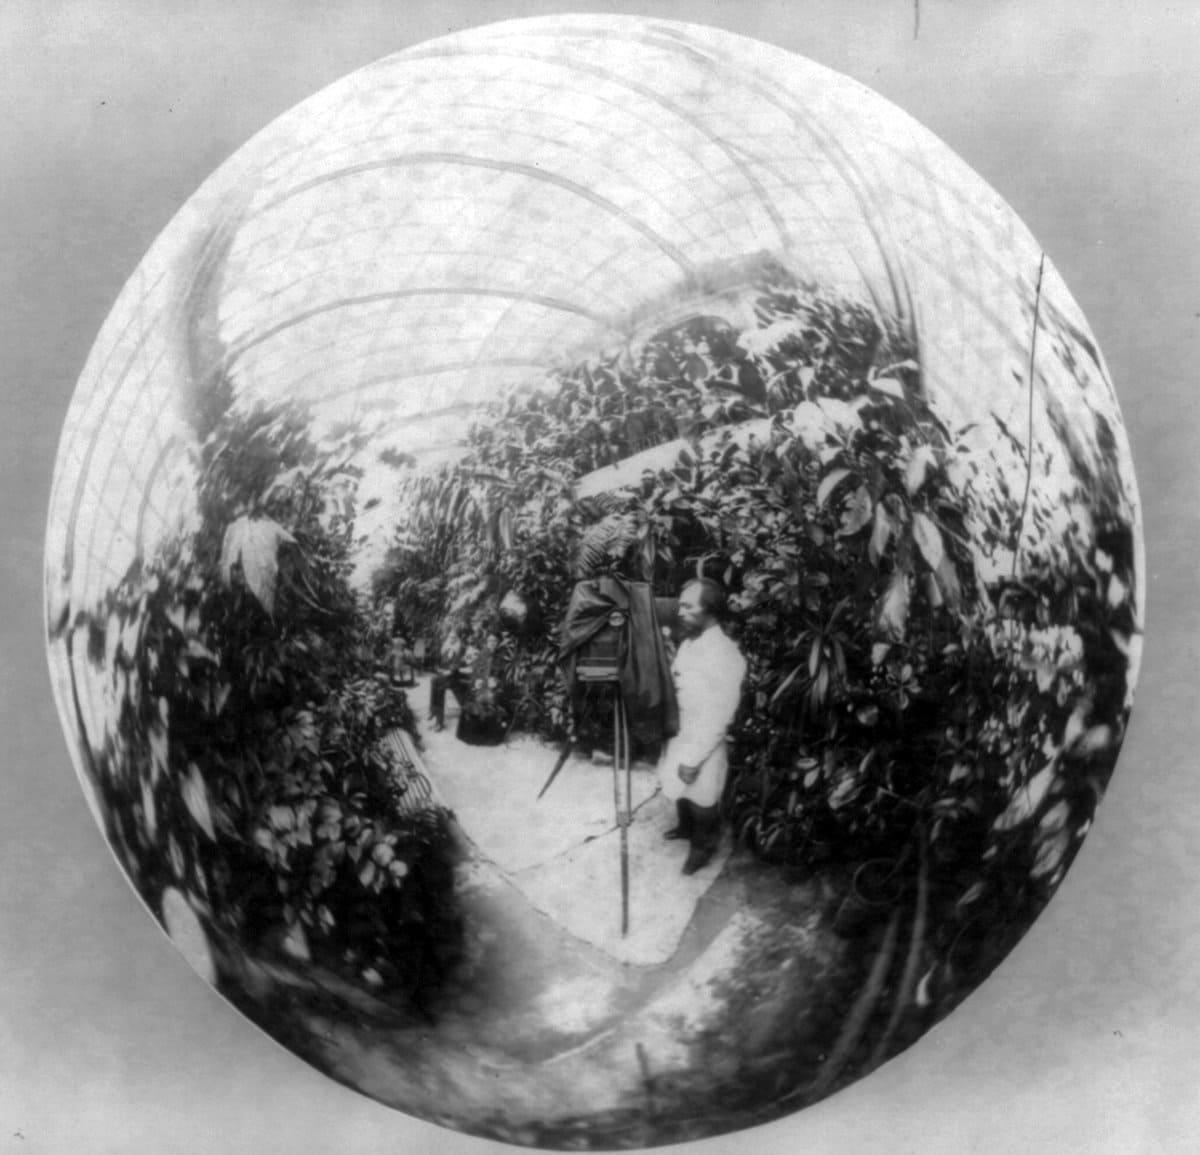 Kuznetsov greenhouse mirrored sphere vintage selfie (c1885) at ClickAmericana com